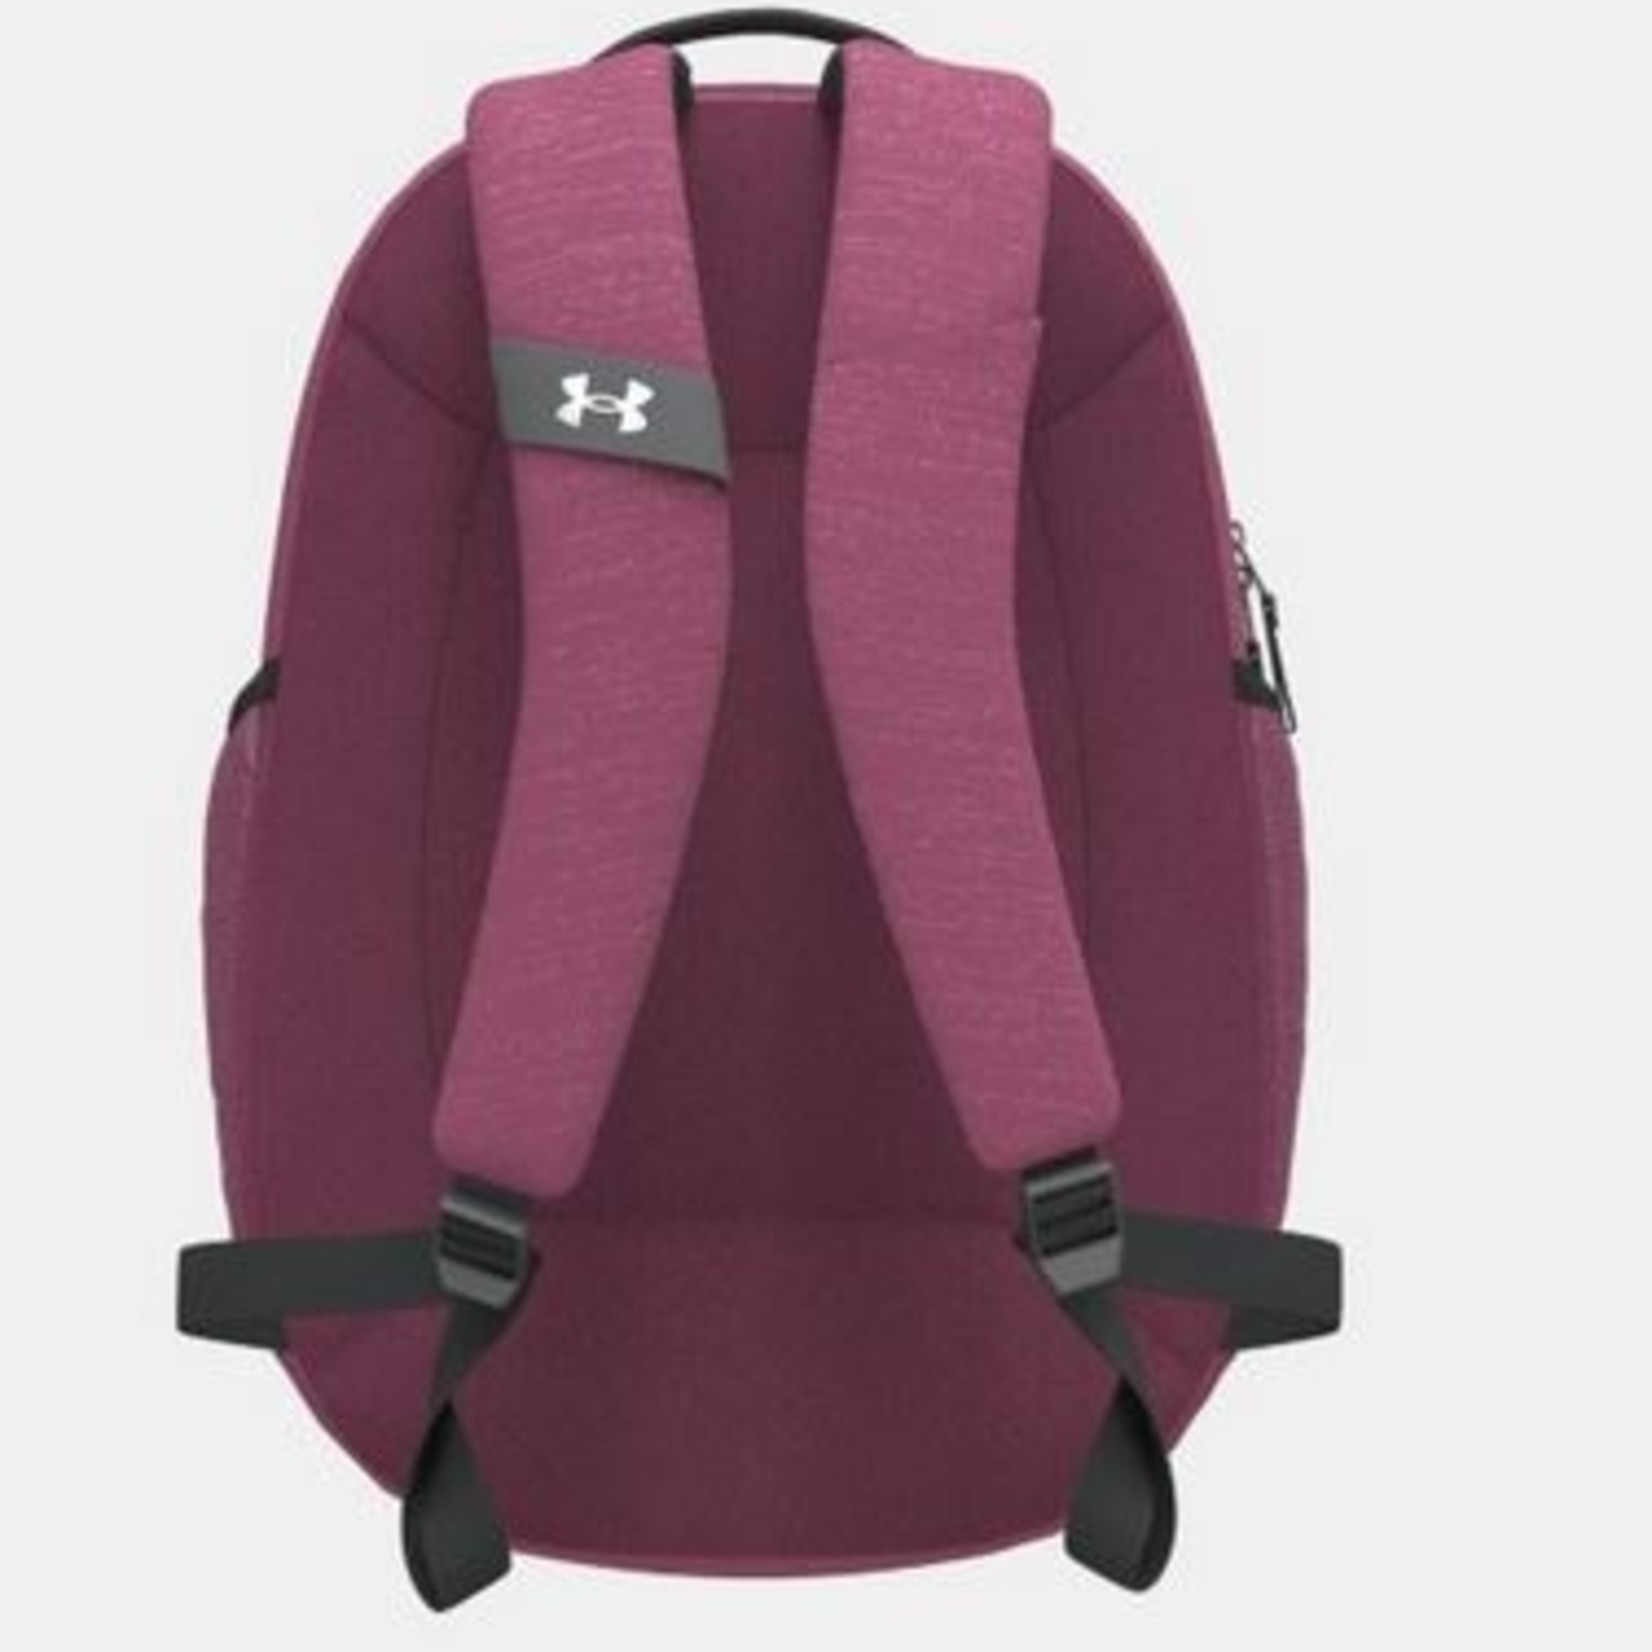 Under Armour UA Hustle Signature Backpack-PNK,OSFA